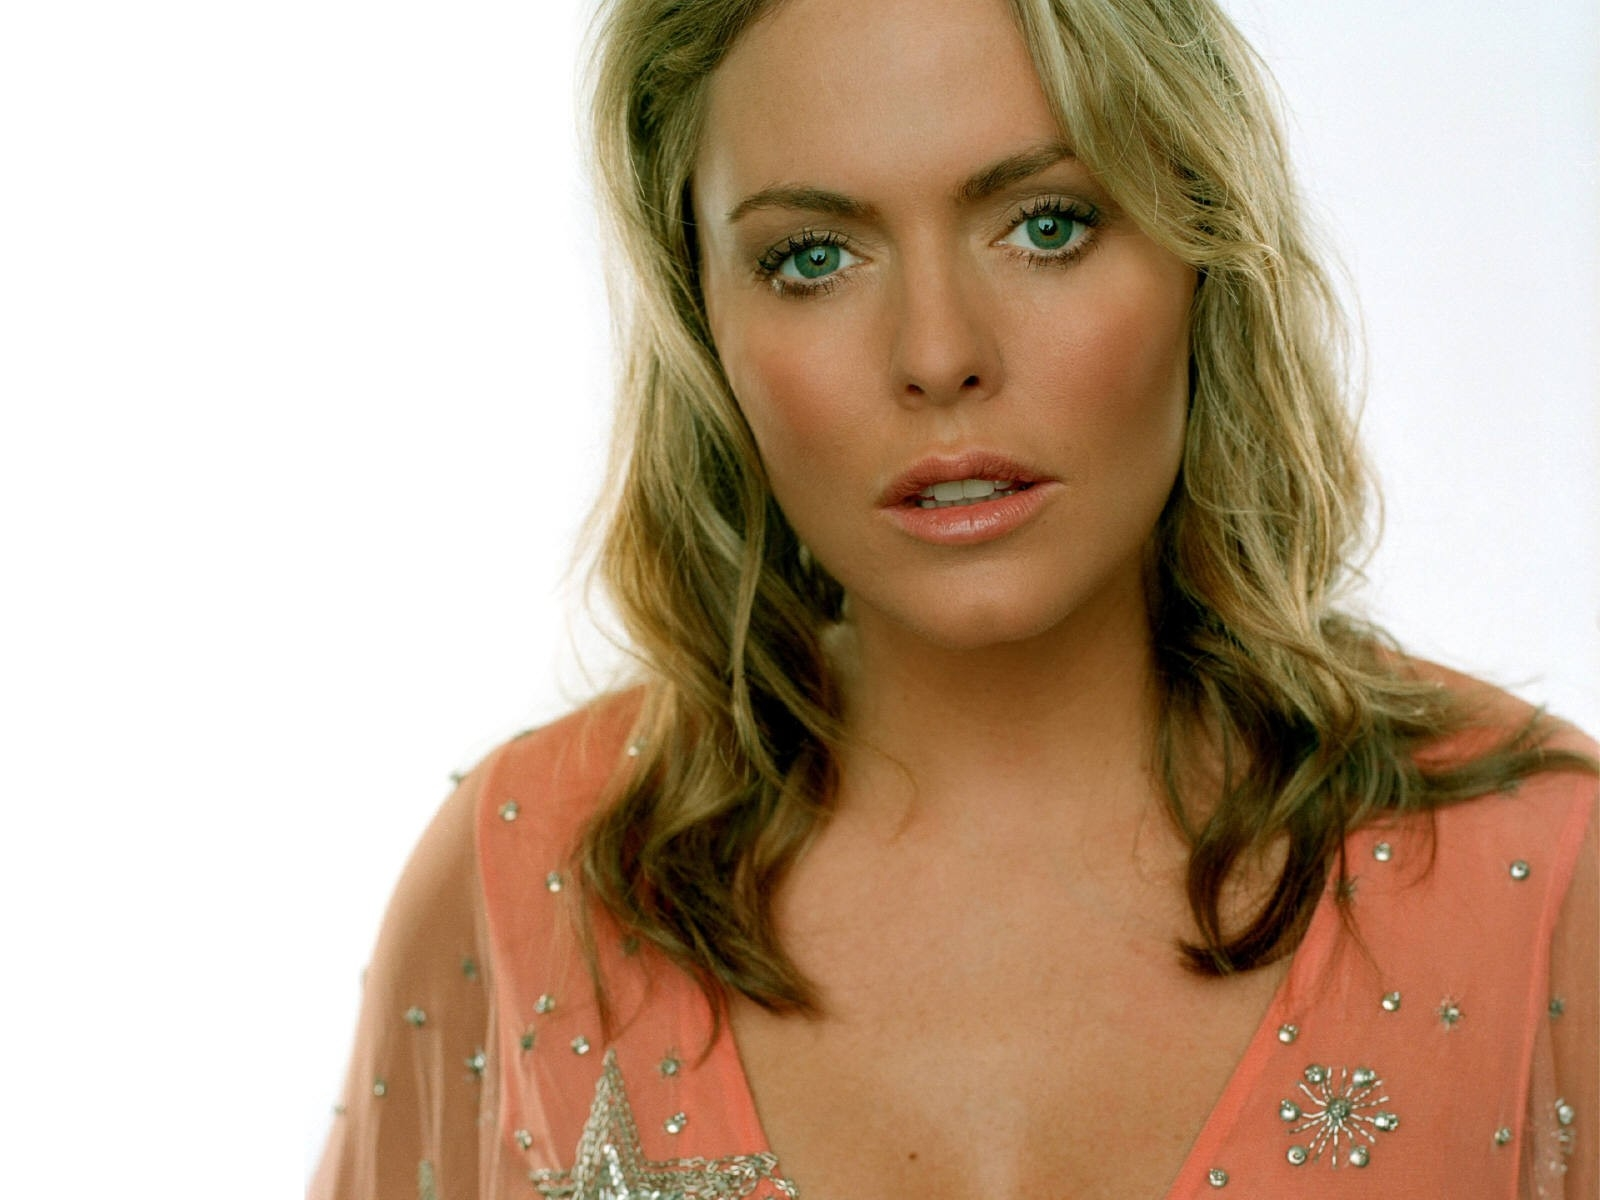 Watch Patsy Kensit (born 1968) video